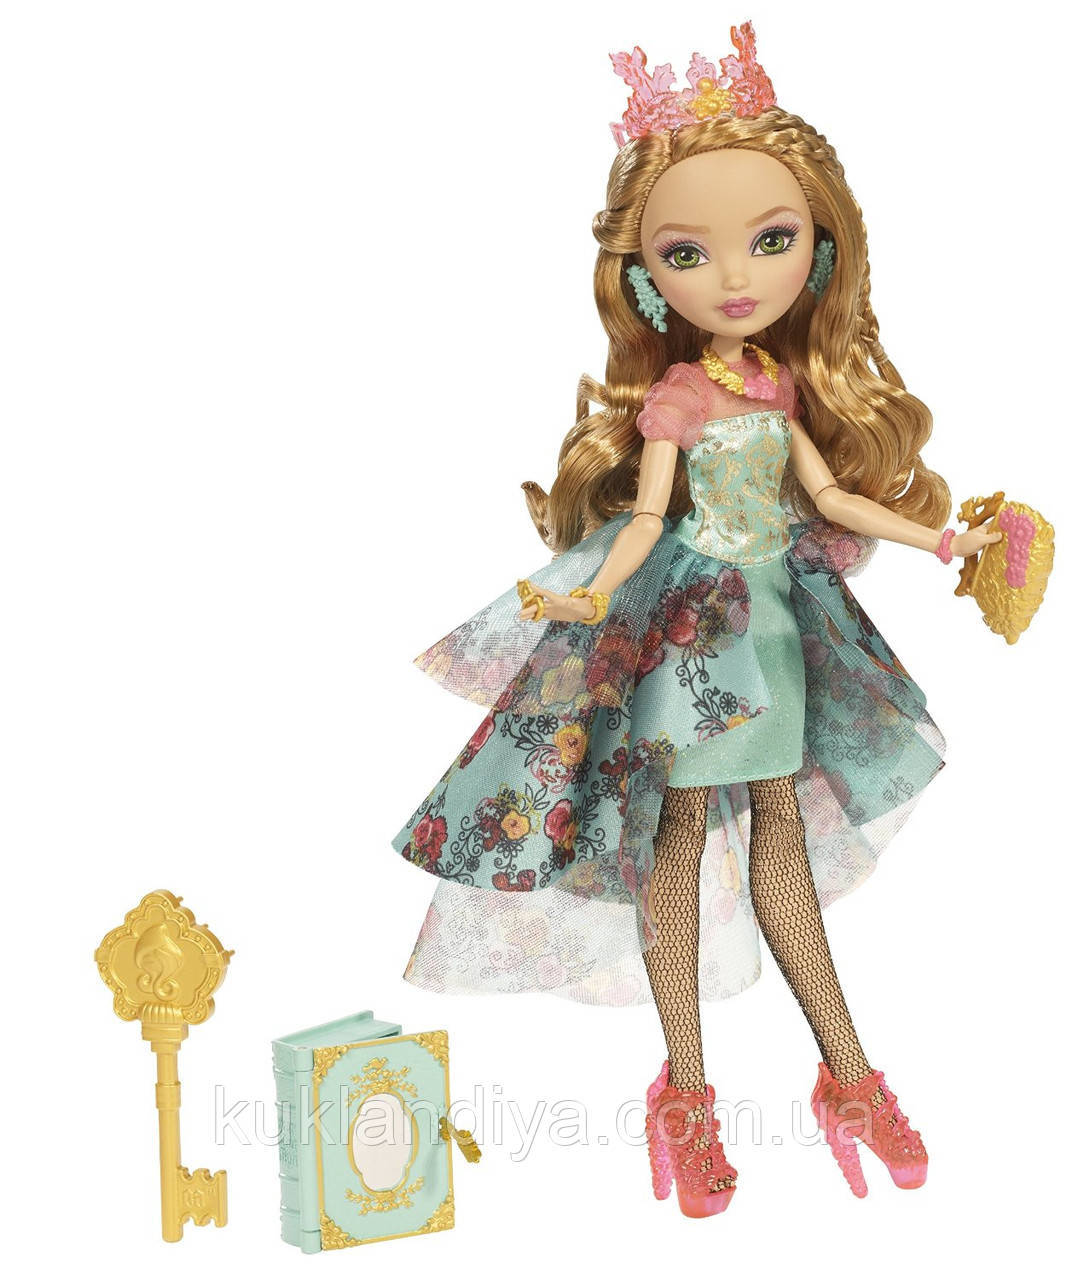 Кукла Ever After High Эшлин Элла День наследия - Legacy Day Ashlynn Ella